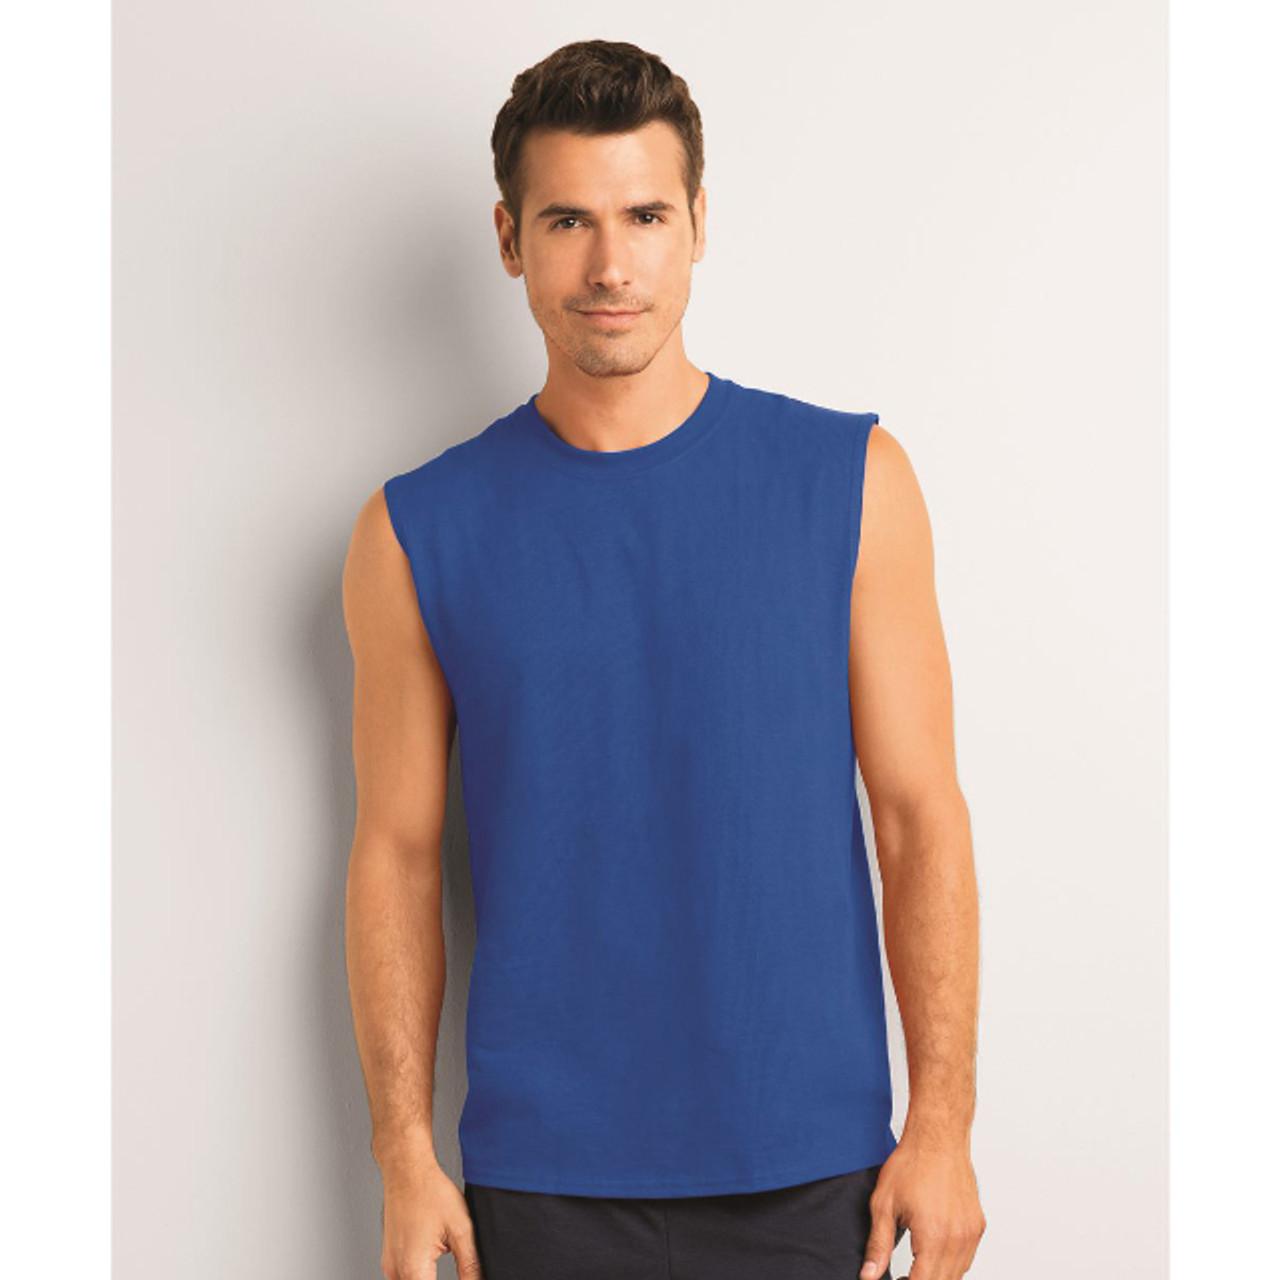 e8750cd4f781f Gildan Ultra Cotton Sleeveless T-Shirt - SportHeadband.com